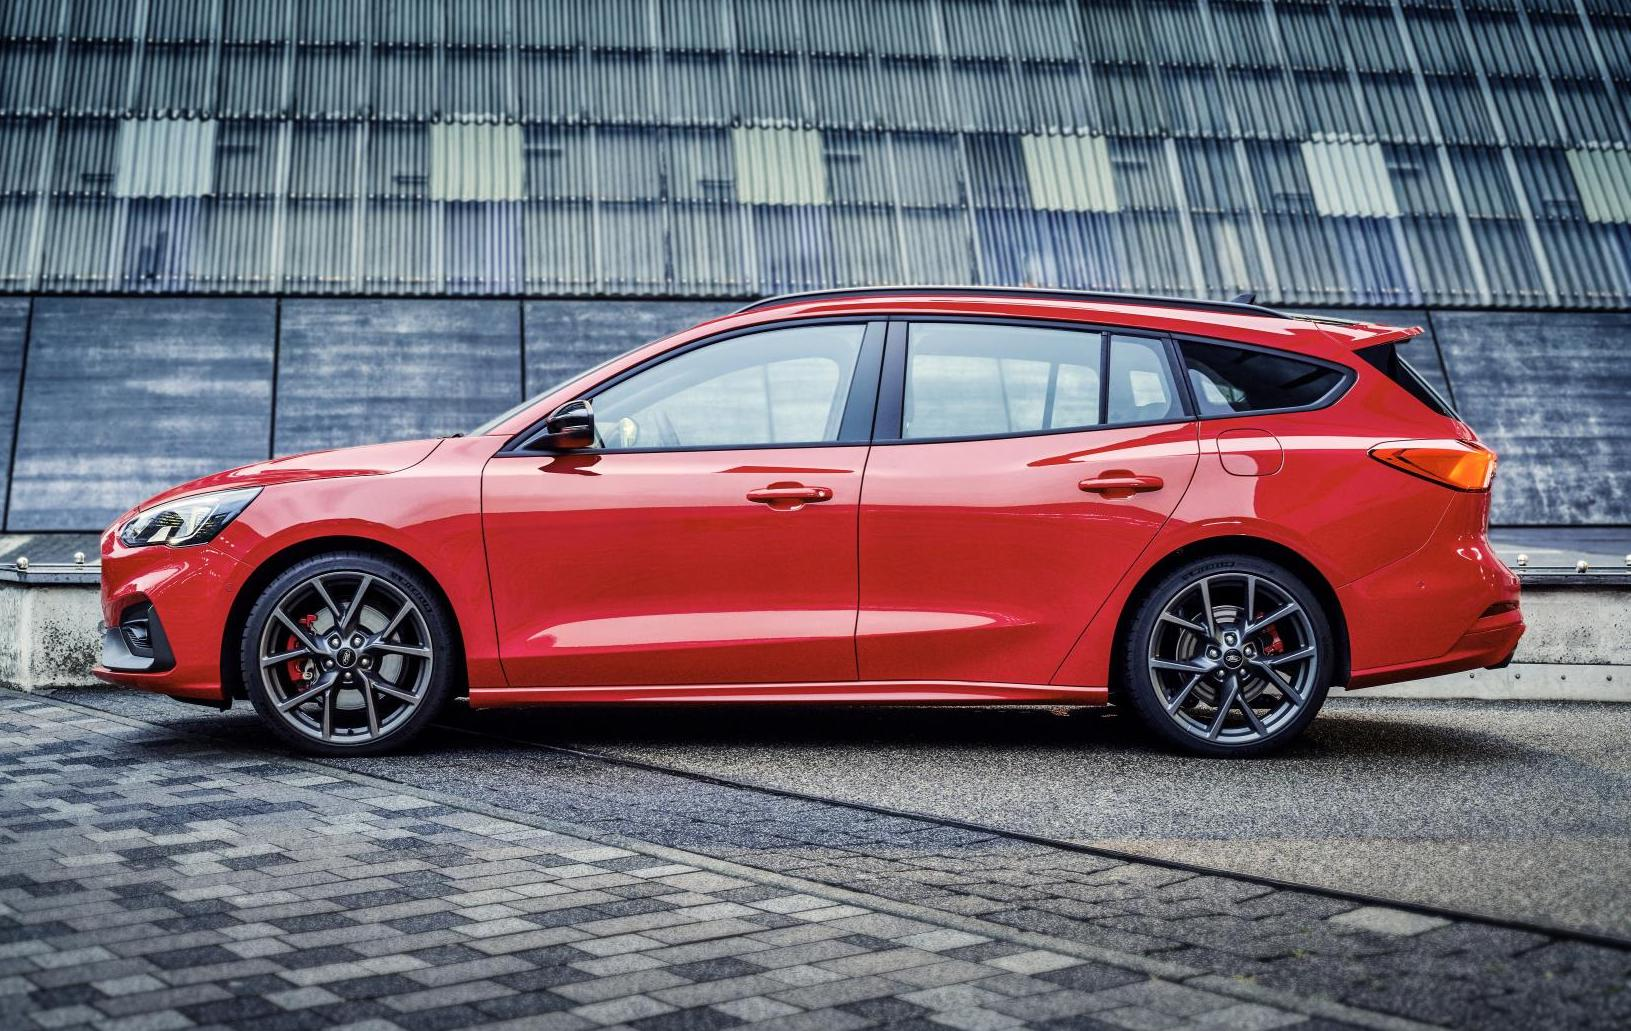 2019 Ford Focus St Wagon Revealed Performancedrive